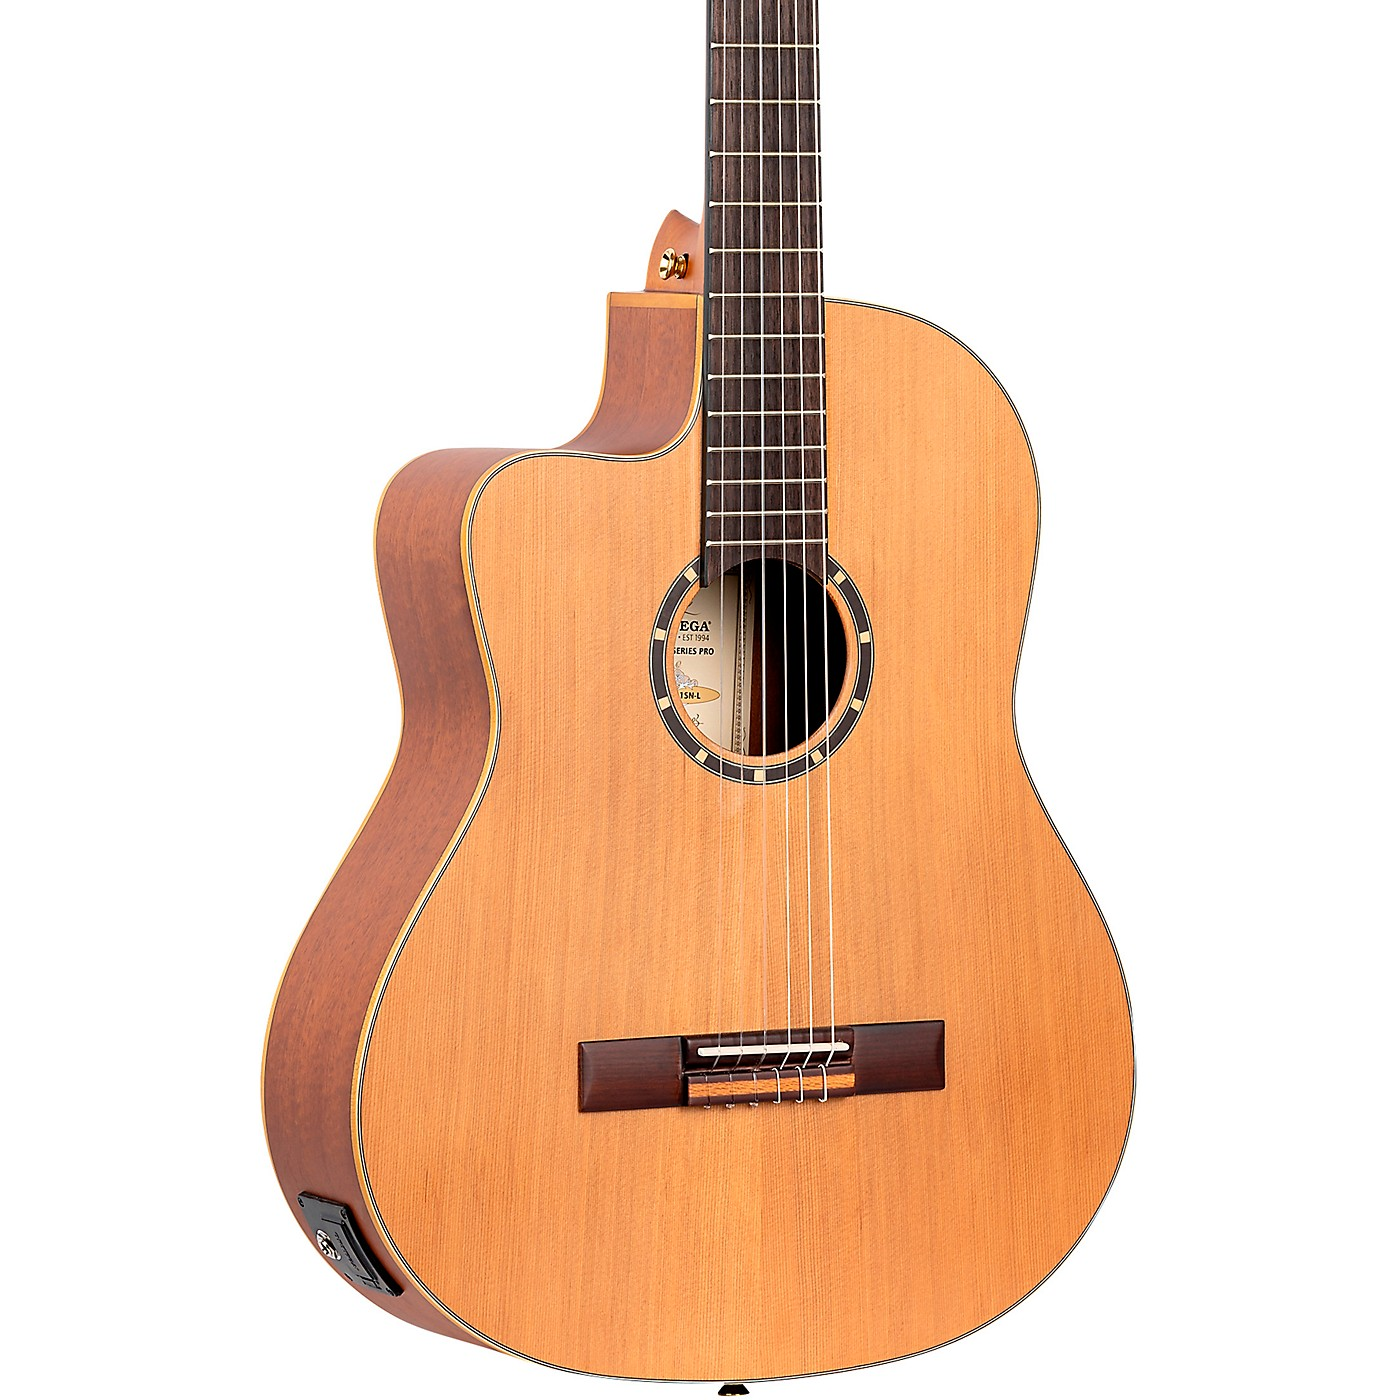 Ortega Family Series Pro RCE131SN-L Acoustic Electric Slim Neck Classical Guitar thumbnail